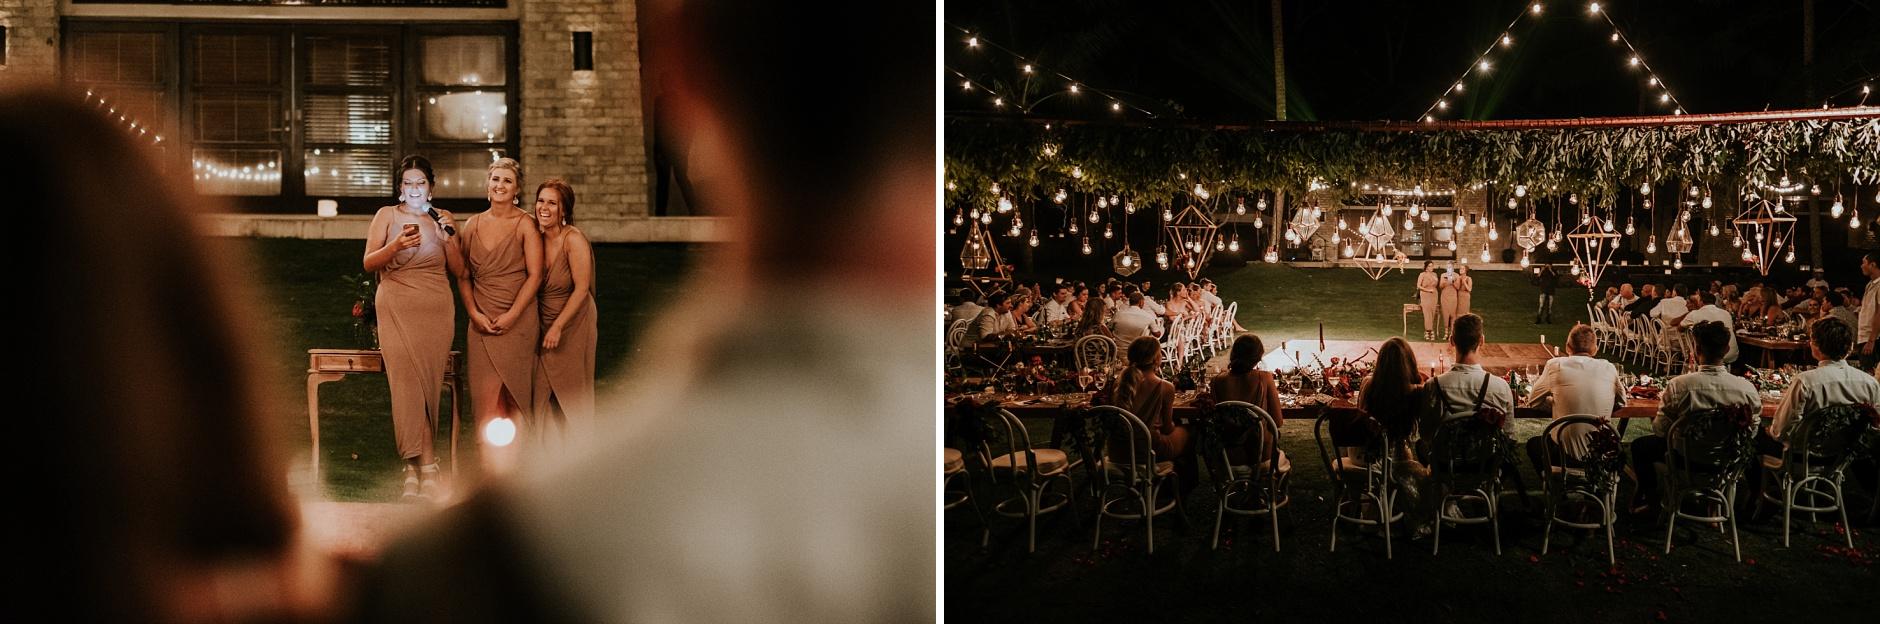 breanna&dan0610a_Bali-Wedding-Photographer.jpg